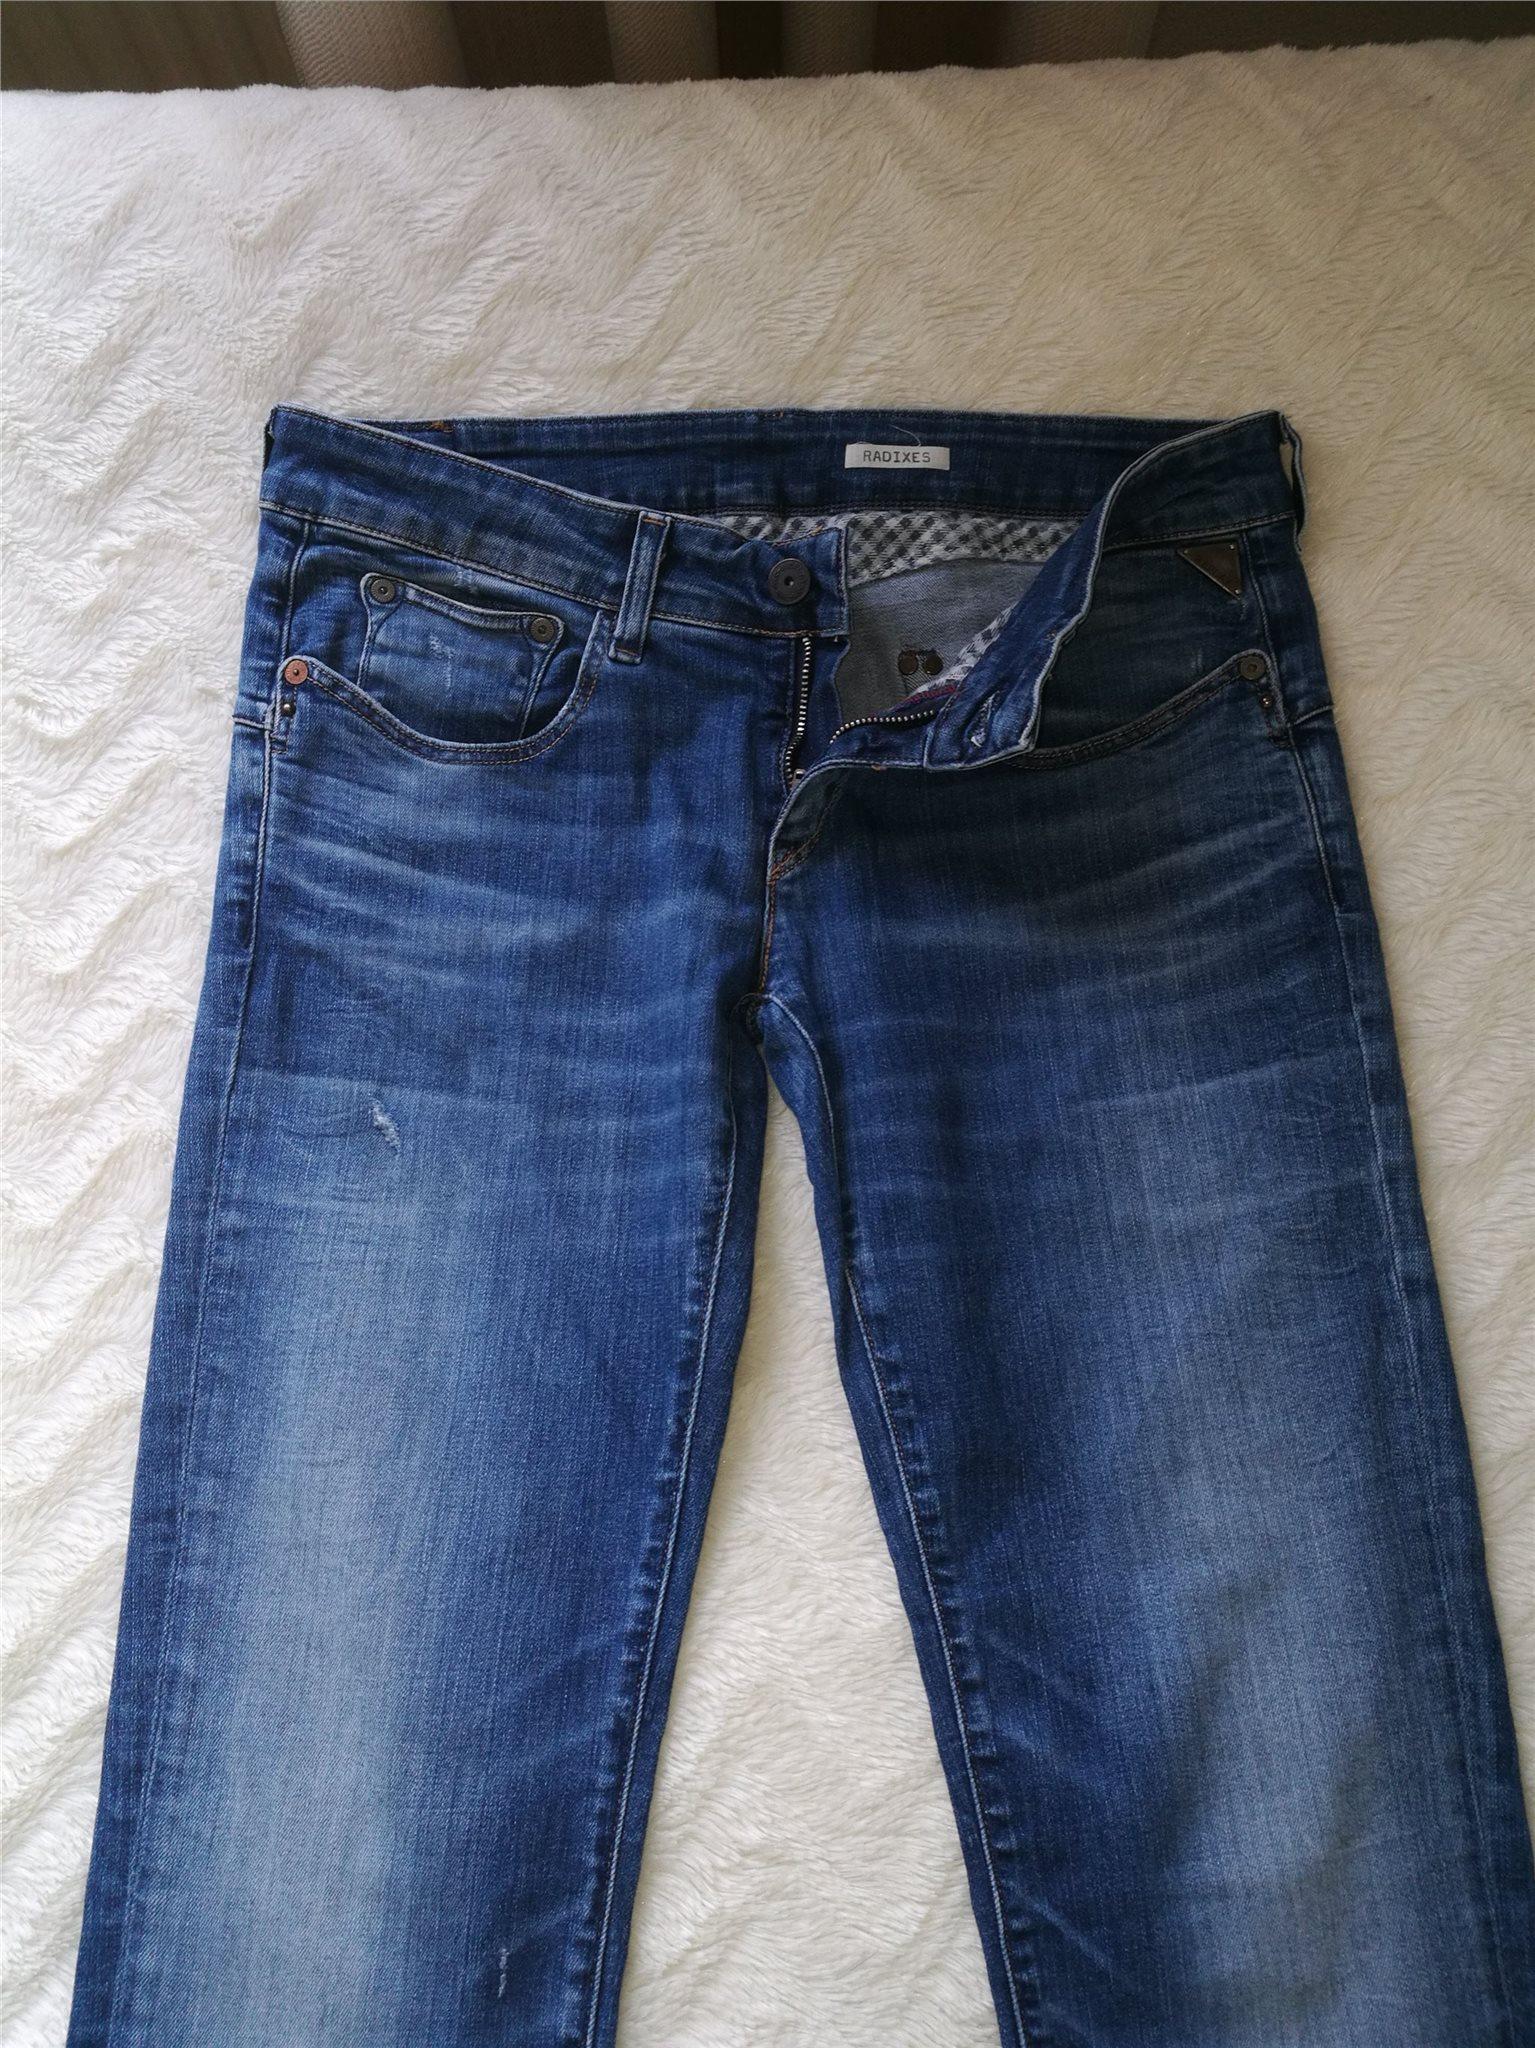 jeans storlek tum